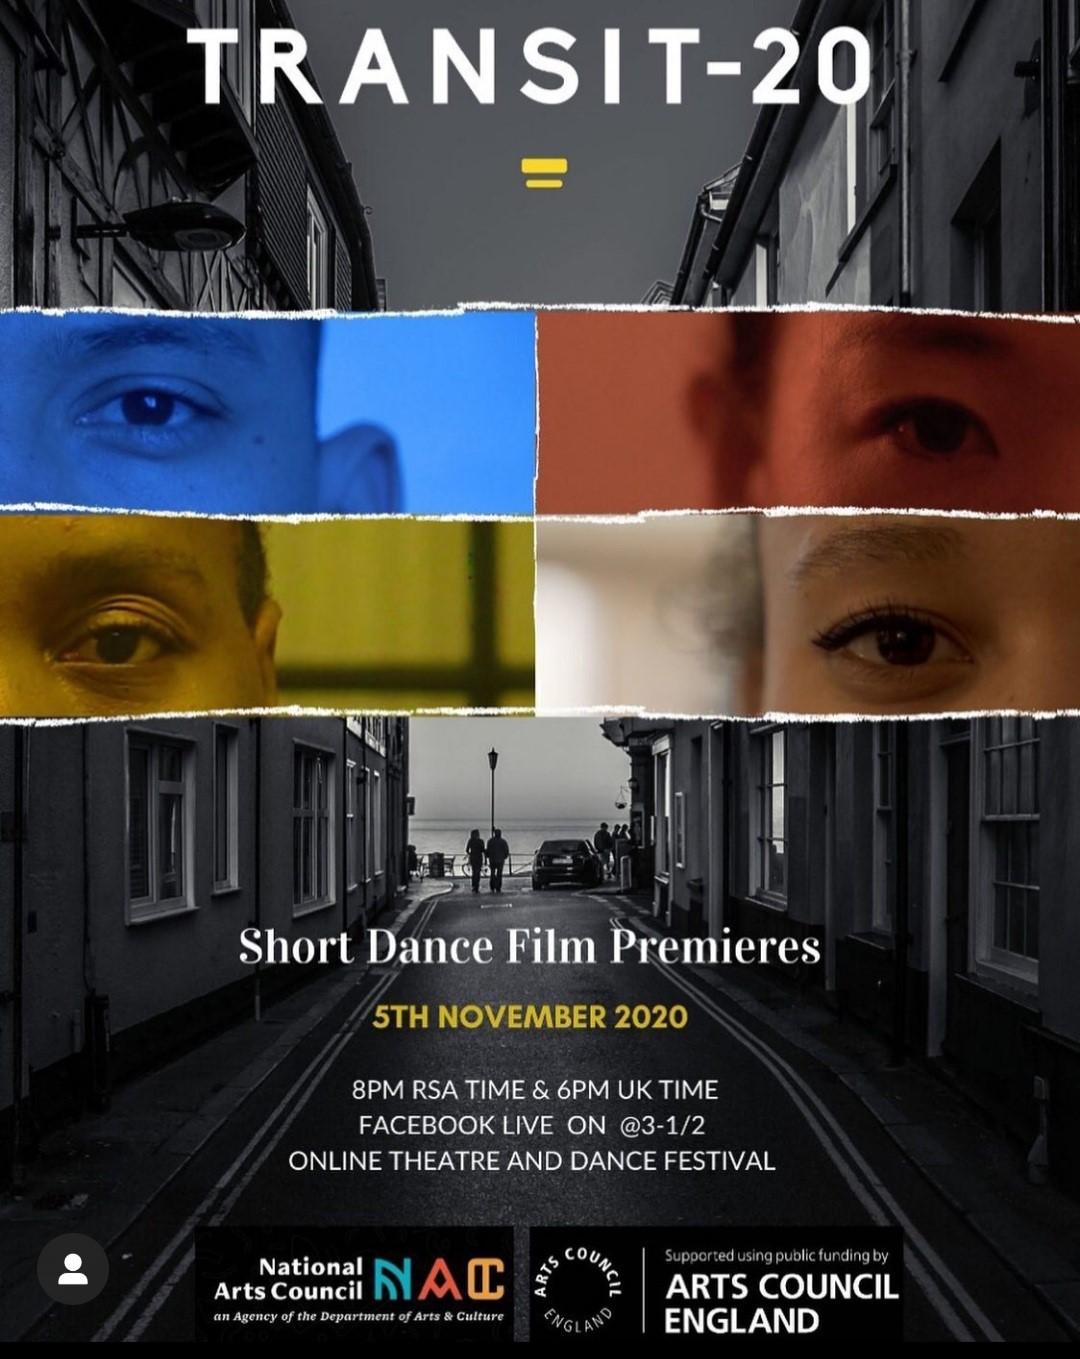 Transit-10 film premiere